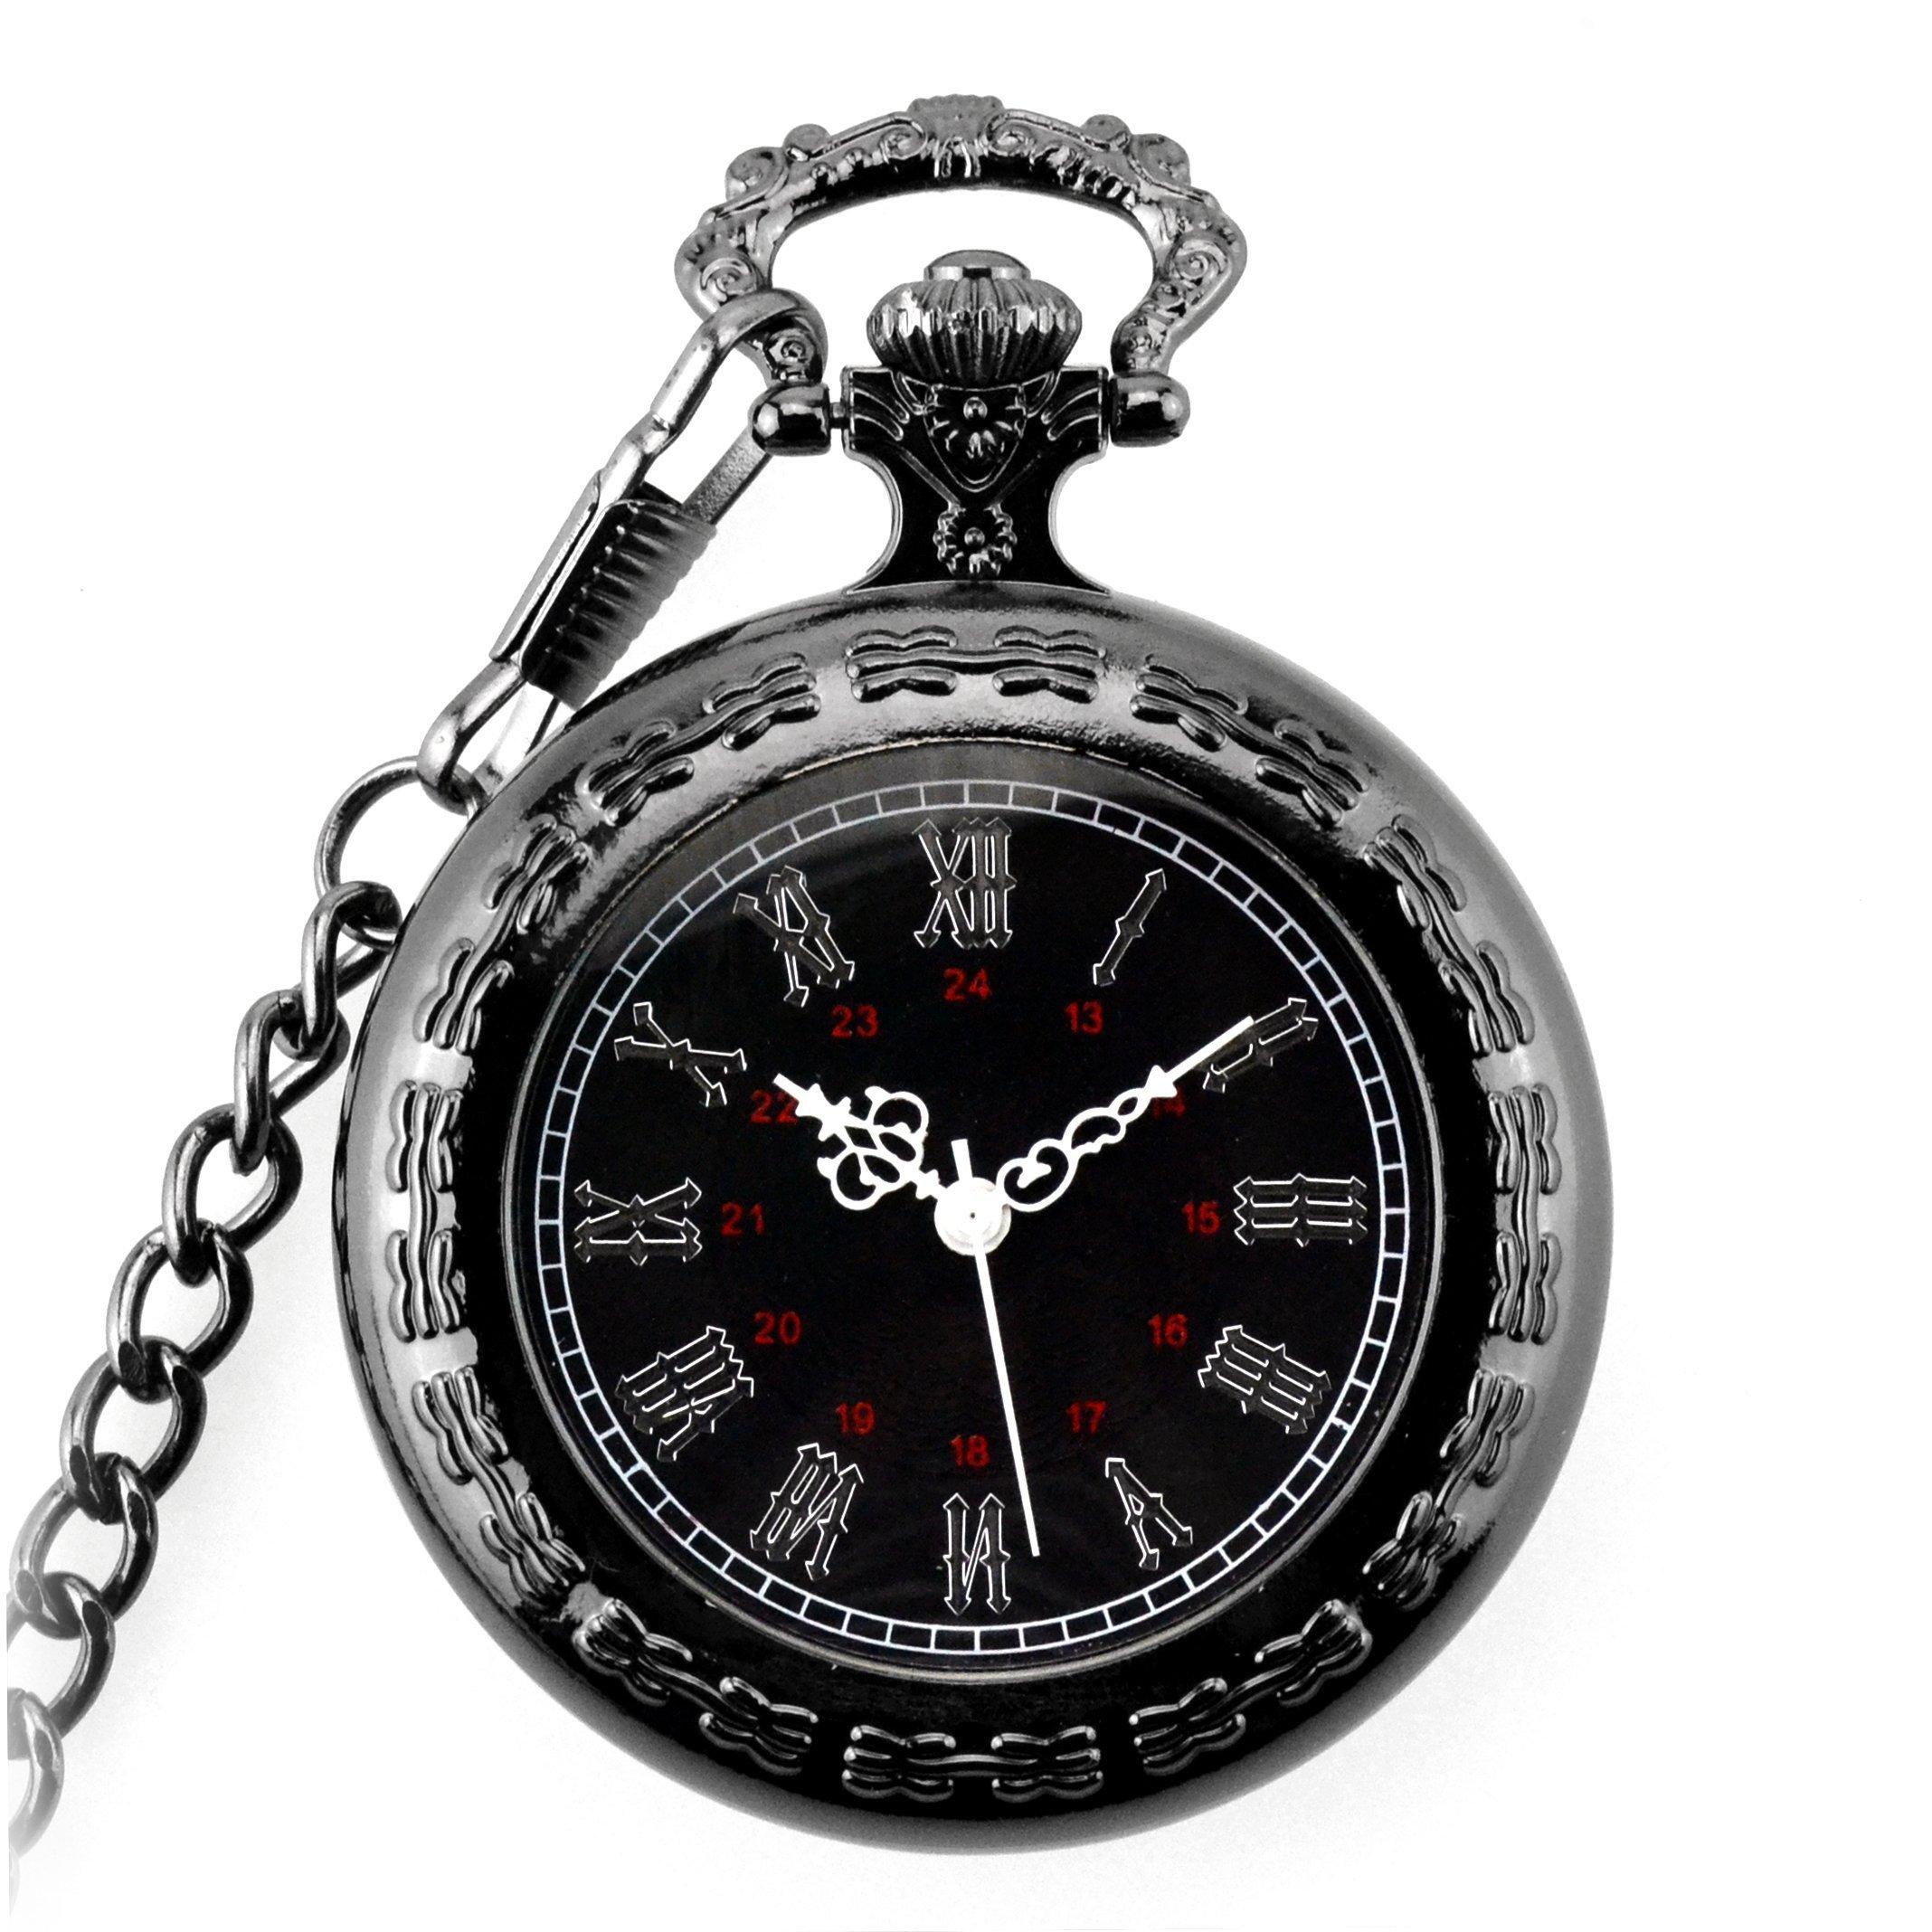 Powshop Vintage Roman Numerals Pocket Watch Steampunk Retro Vintage Black Quartz Watches with 14.8''Chain & Gift Box for Men (Black)